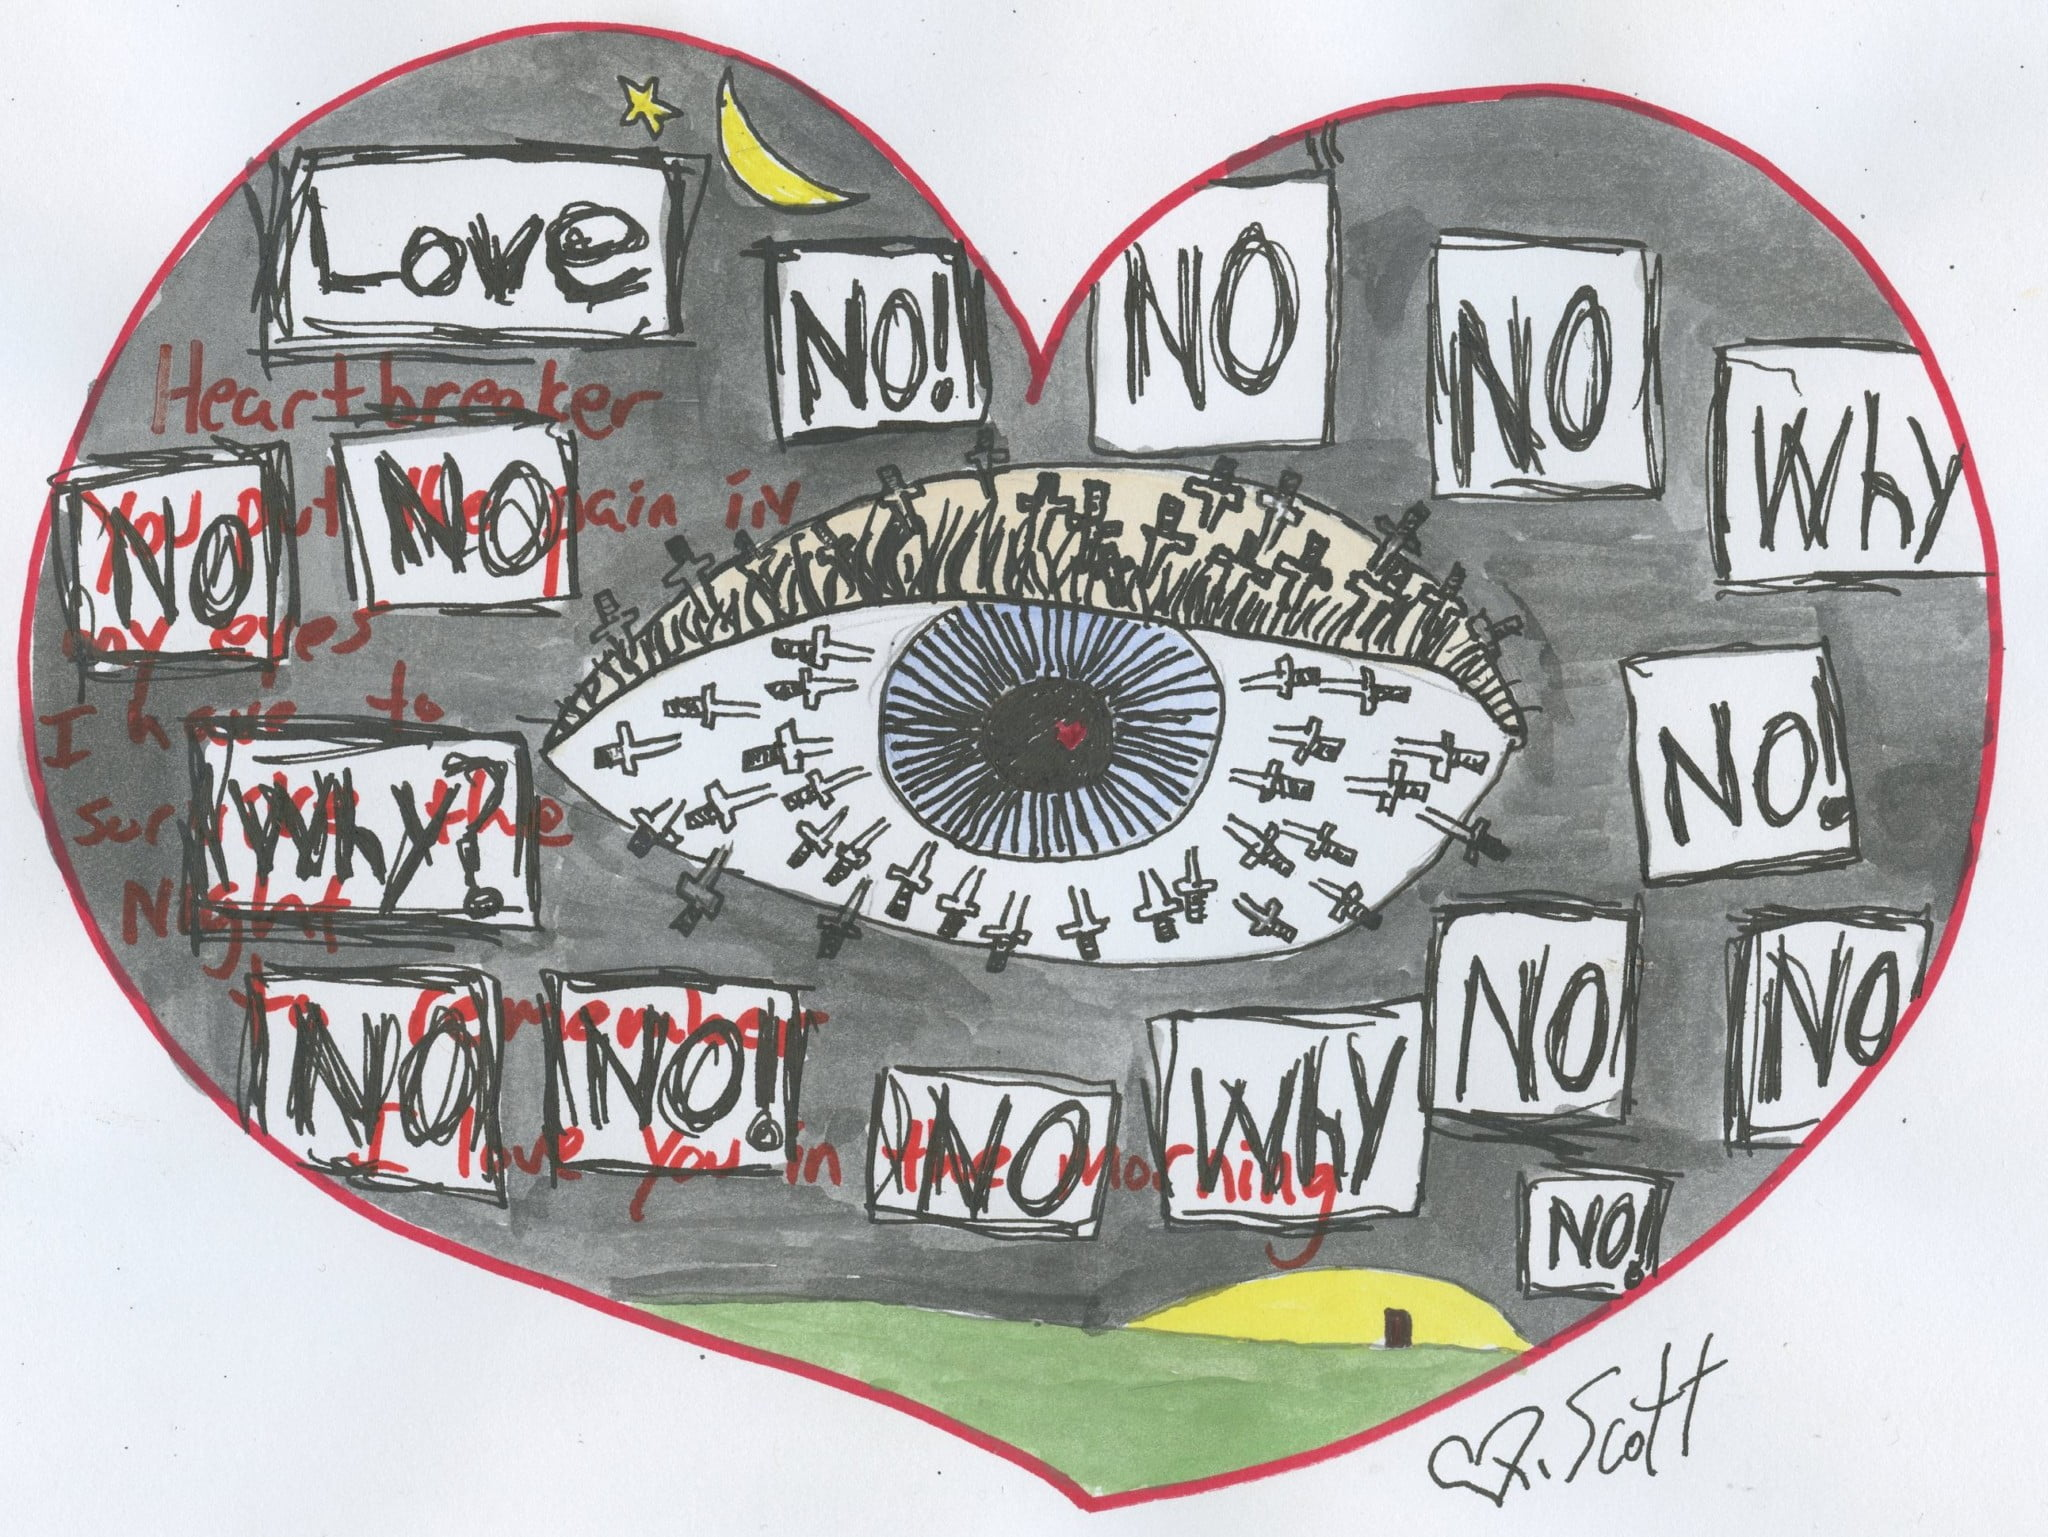 love heart broken